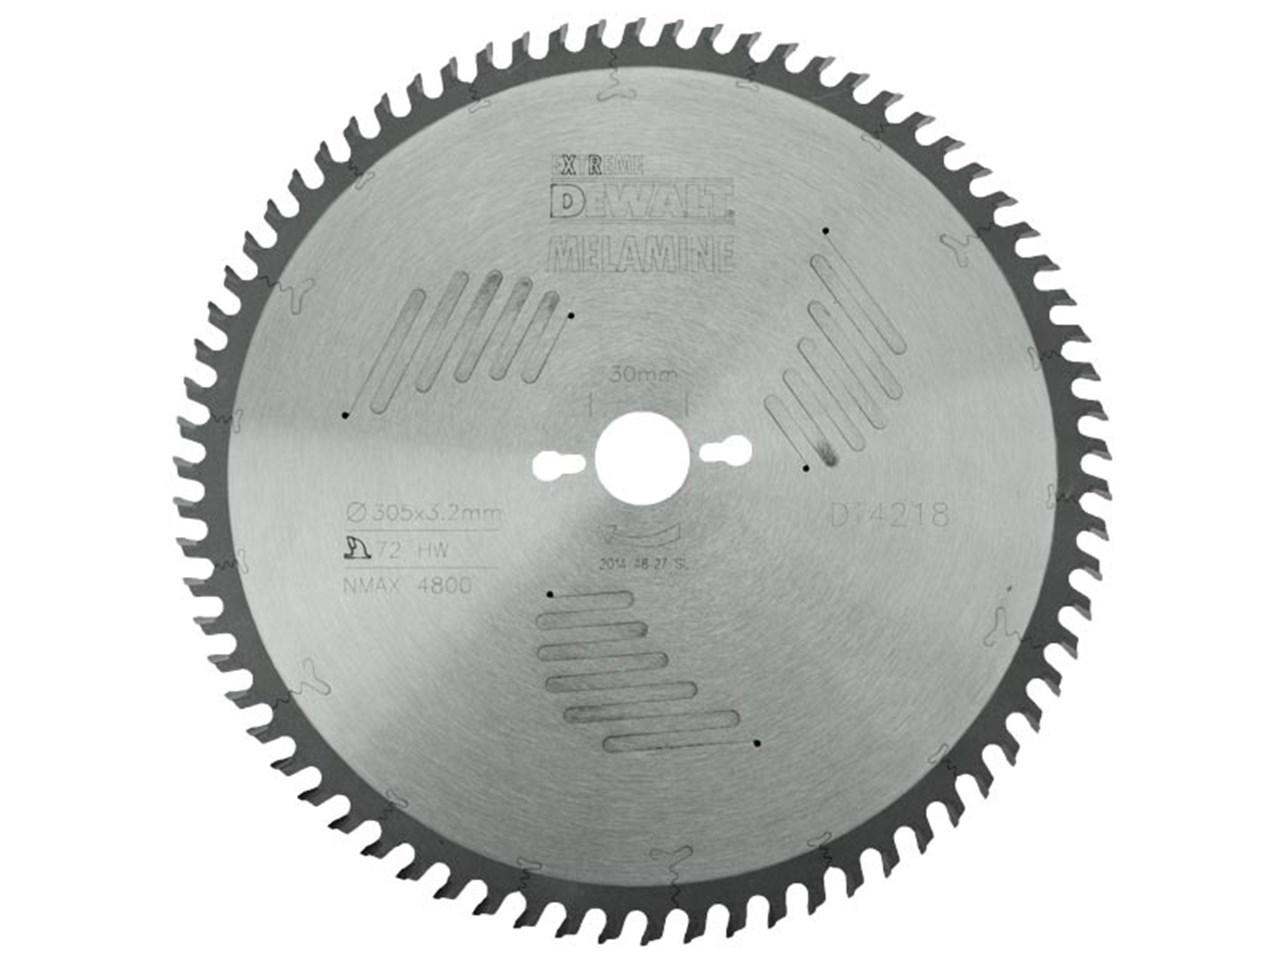 Dewalt dt4218 qz 305 x 30 x 72t hollow ground circular saw blade greentooth Choice Image